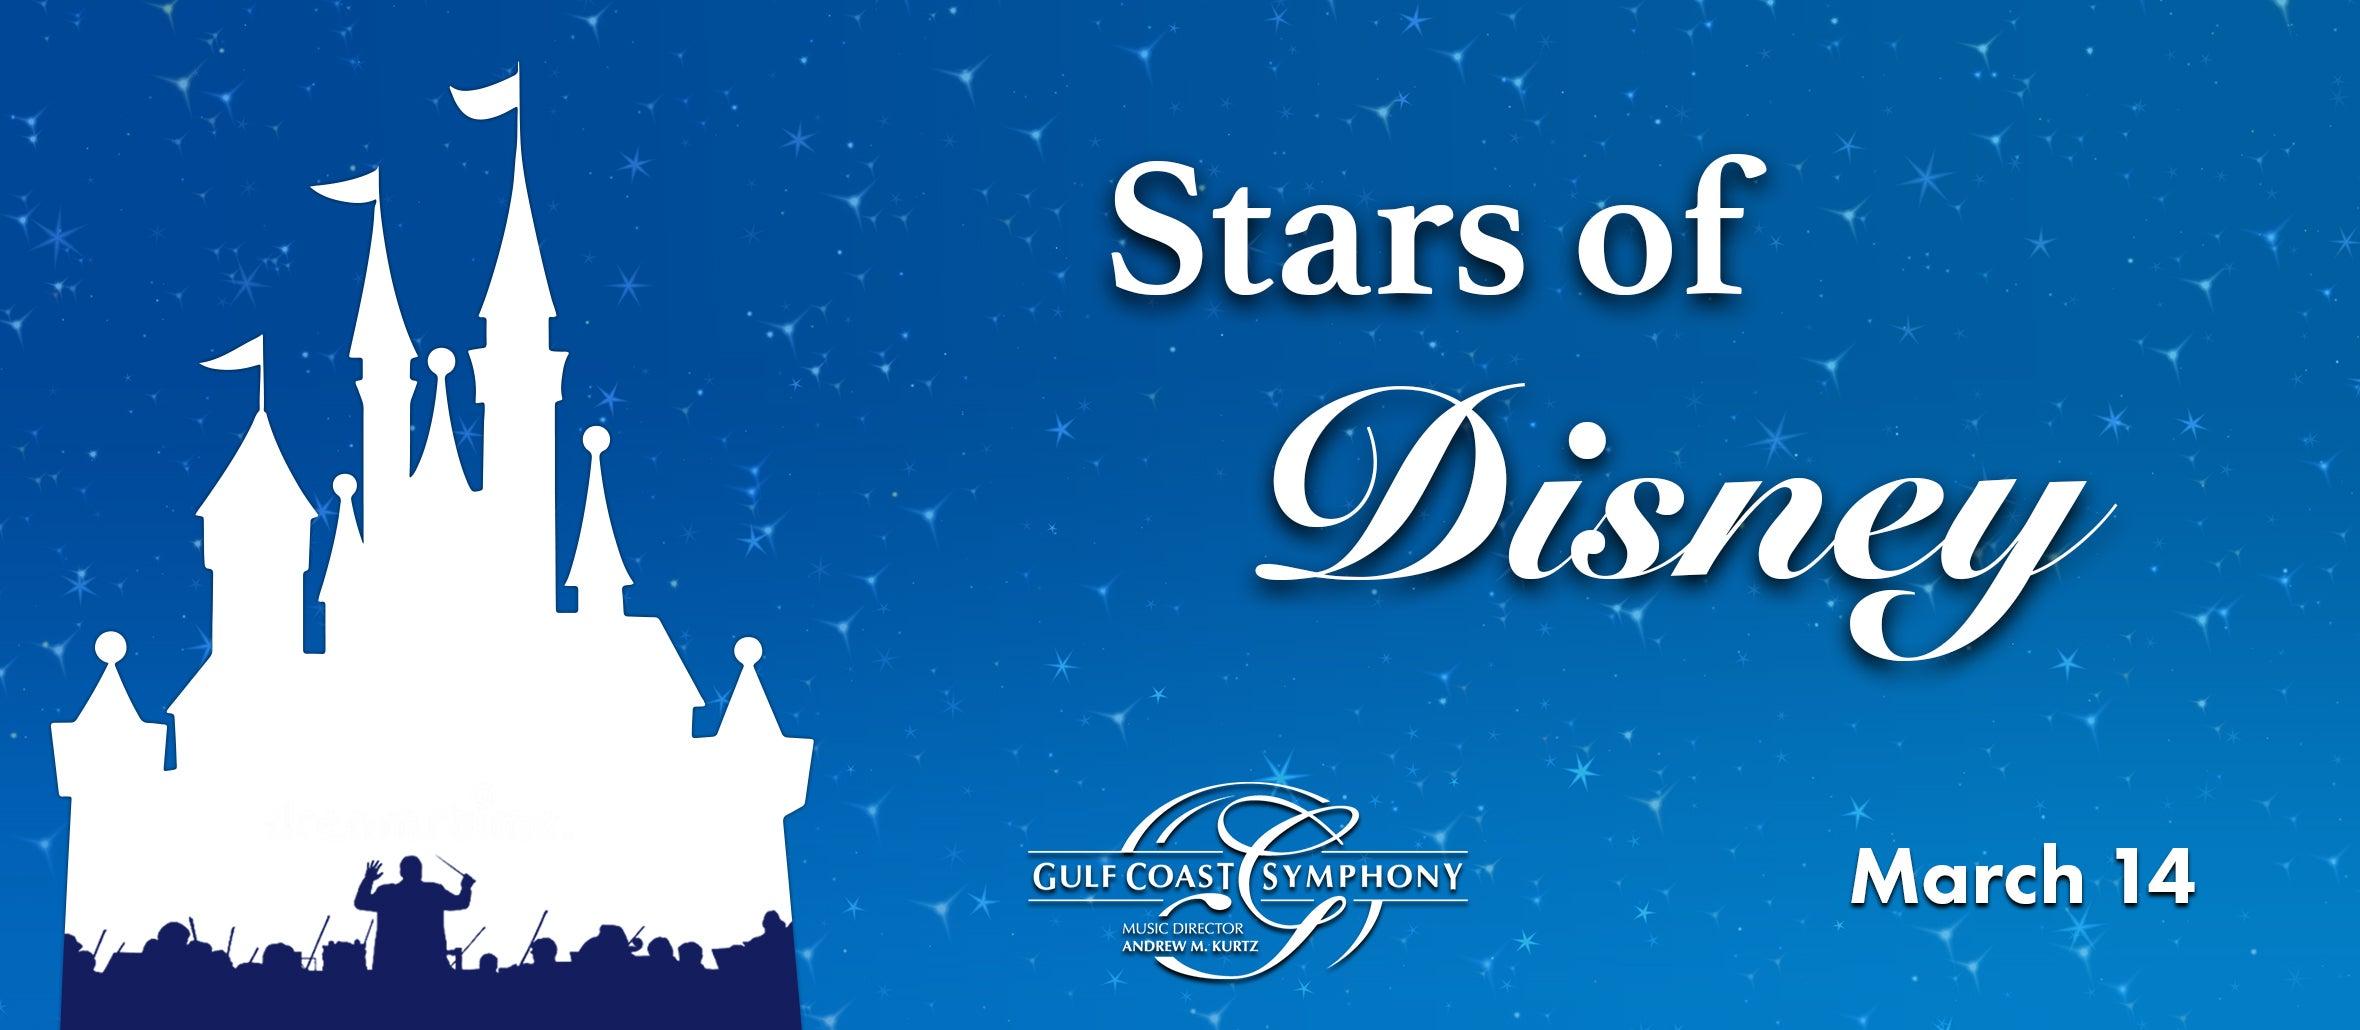 Stars of Disney